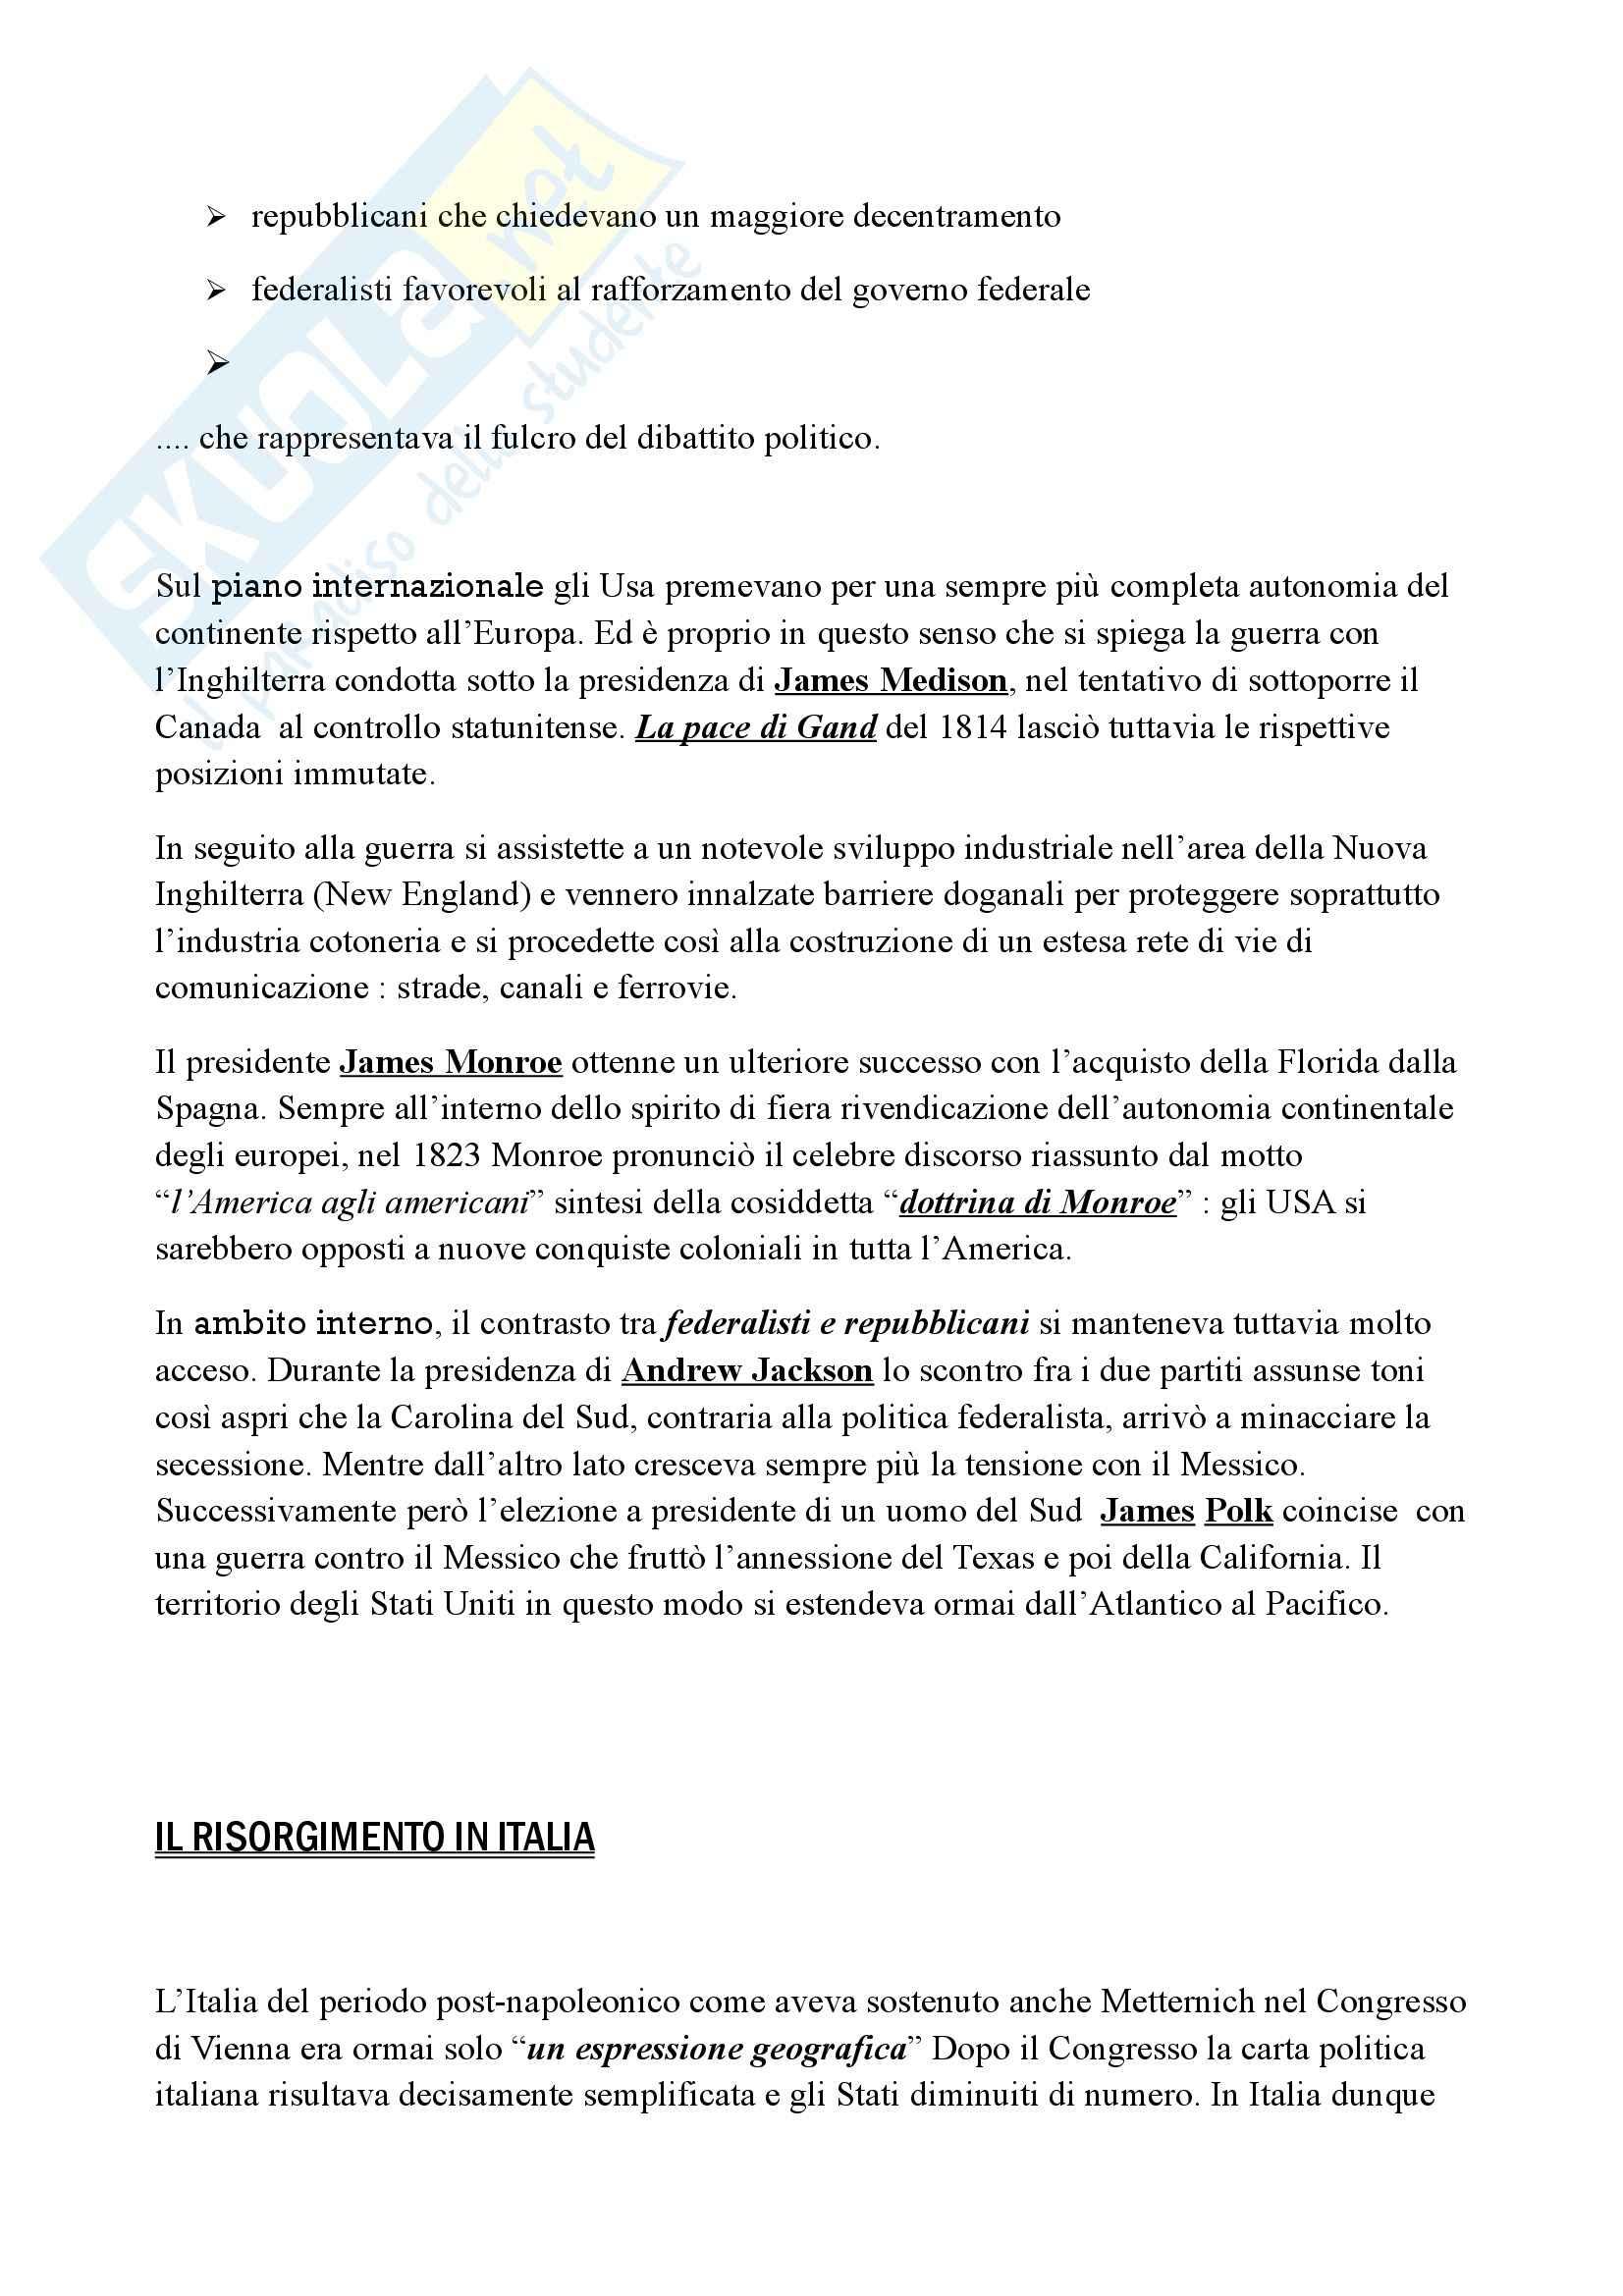 Riassunto esame Storia, prof. Marmo, libro consigliato Storia contemporanea, Lepre, Petraccone Pag. 16